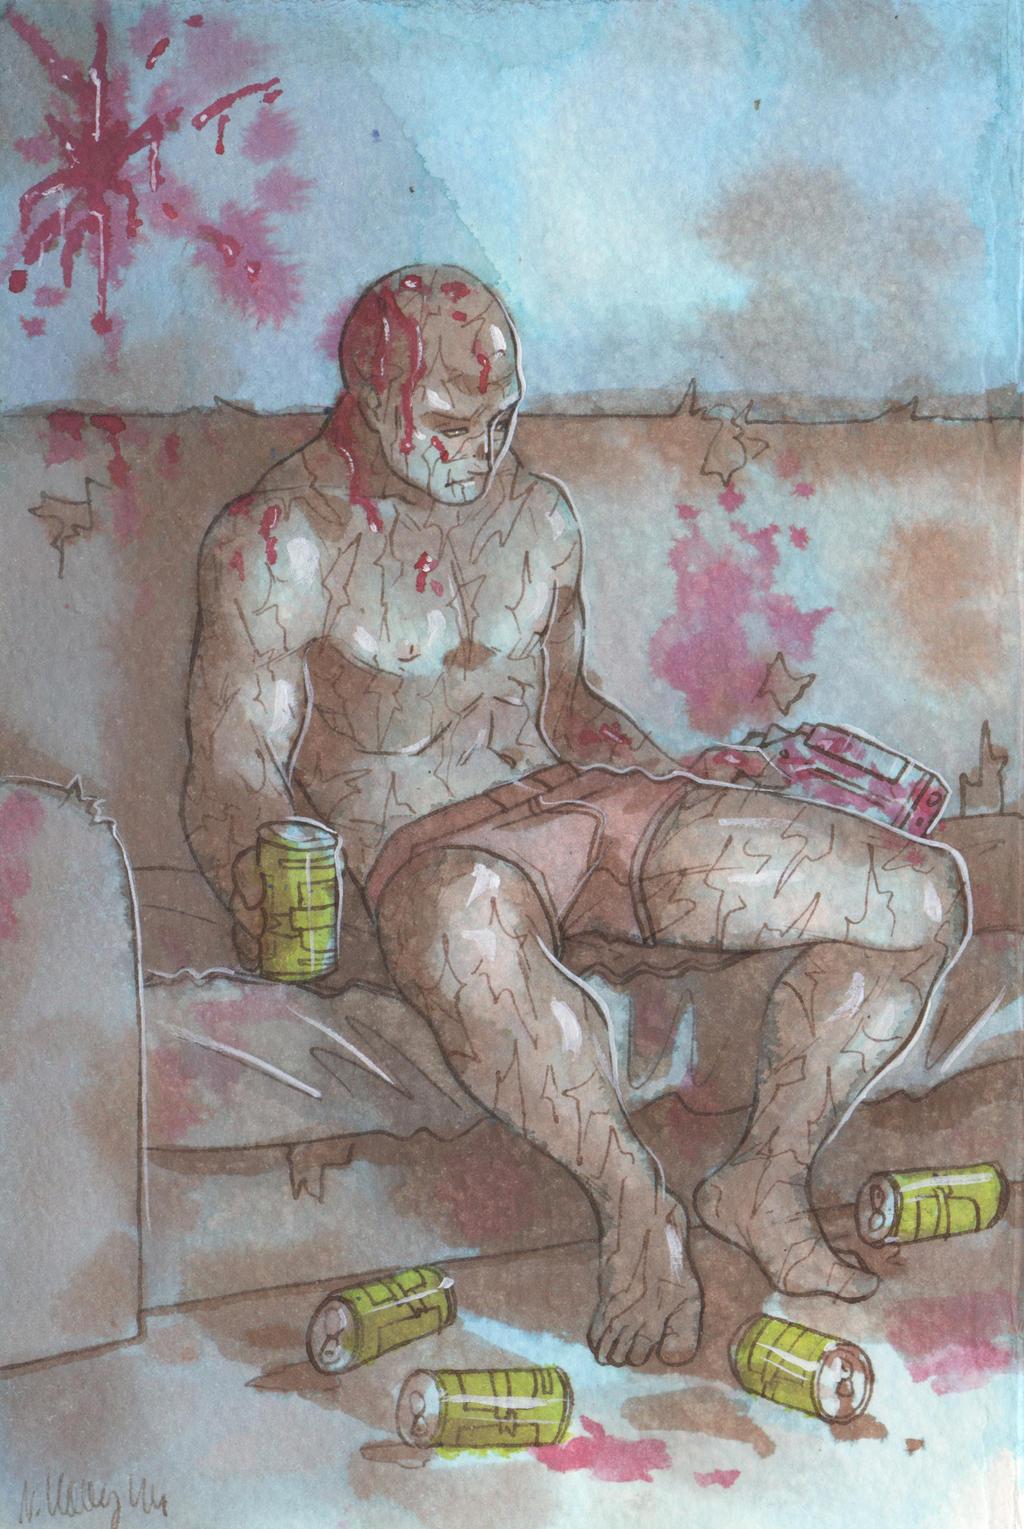 Can't even get drunk [Deadpool] by ProfDrLachfinger